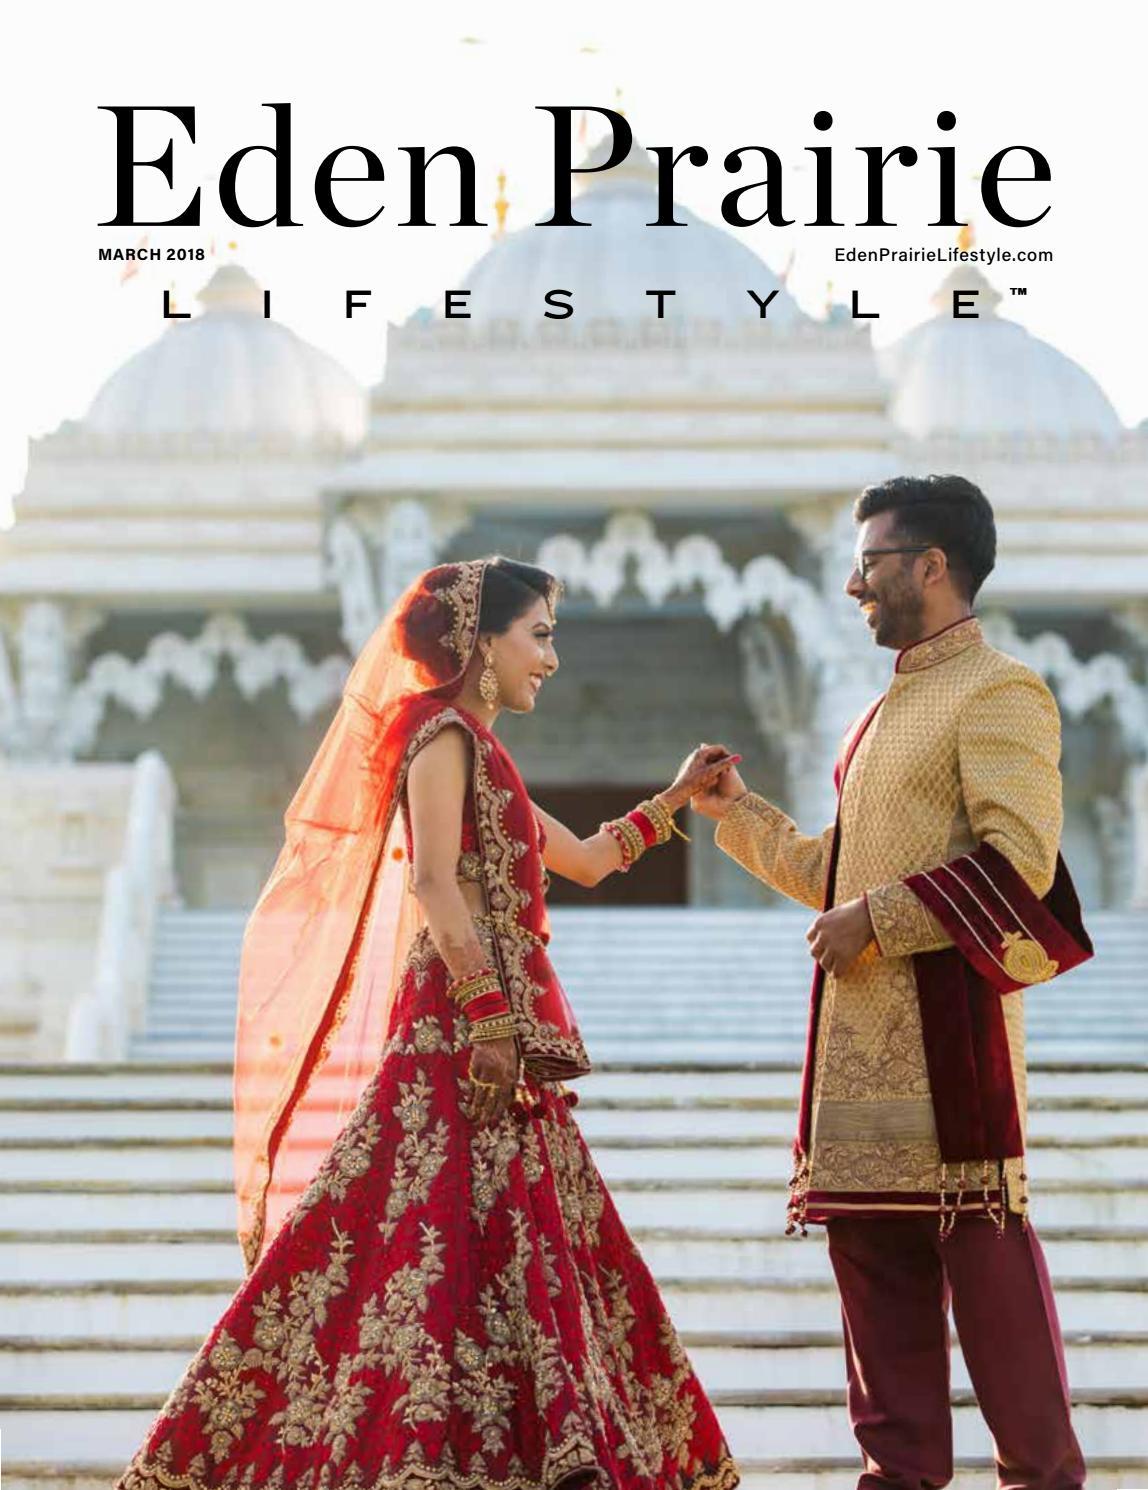 Eden Prairie, MN March 2018 by Lifestyle Publications - issuu